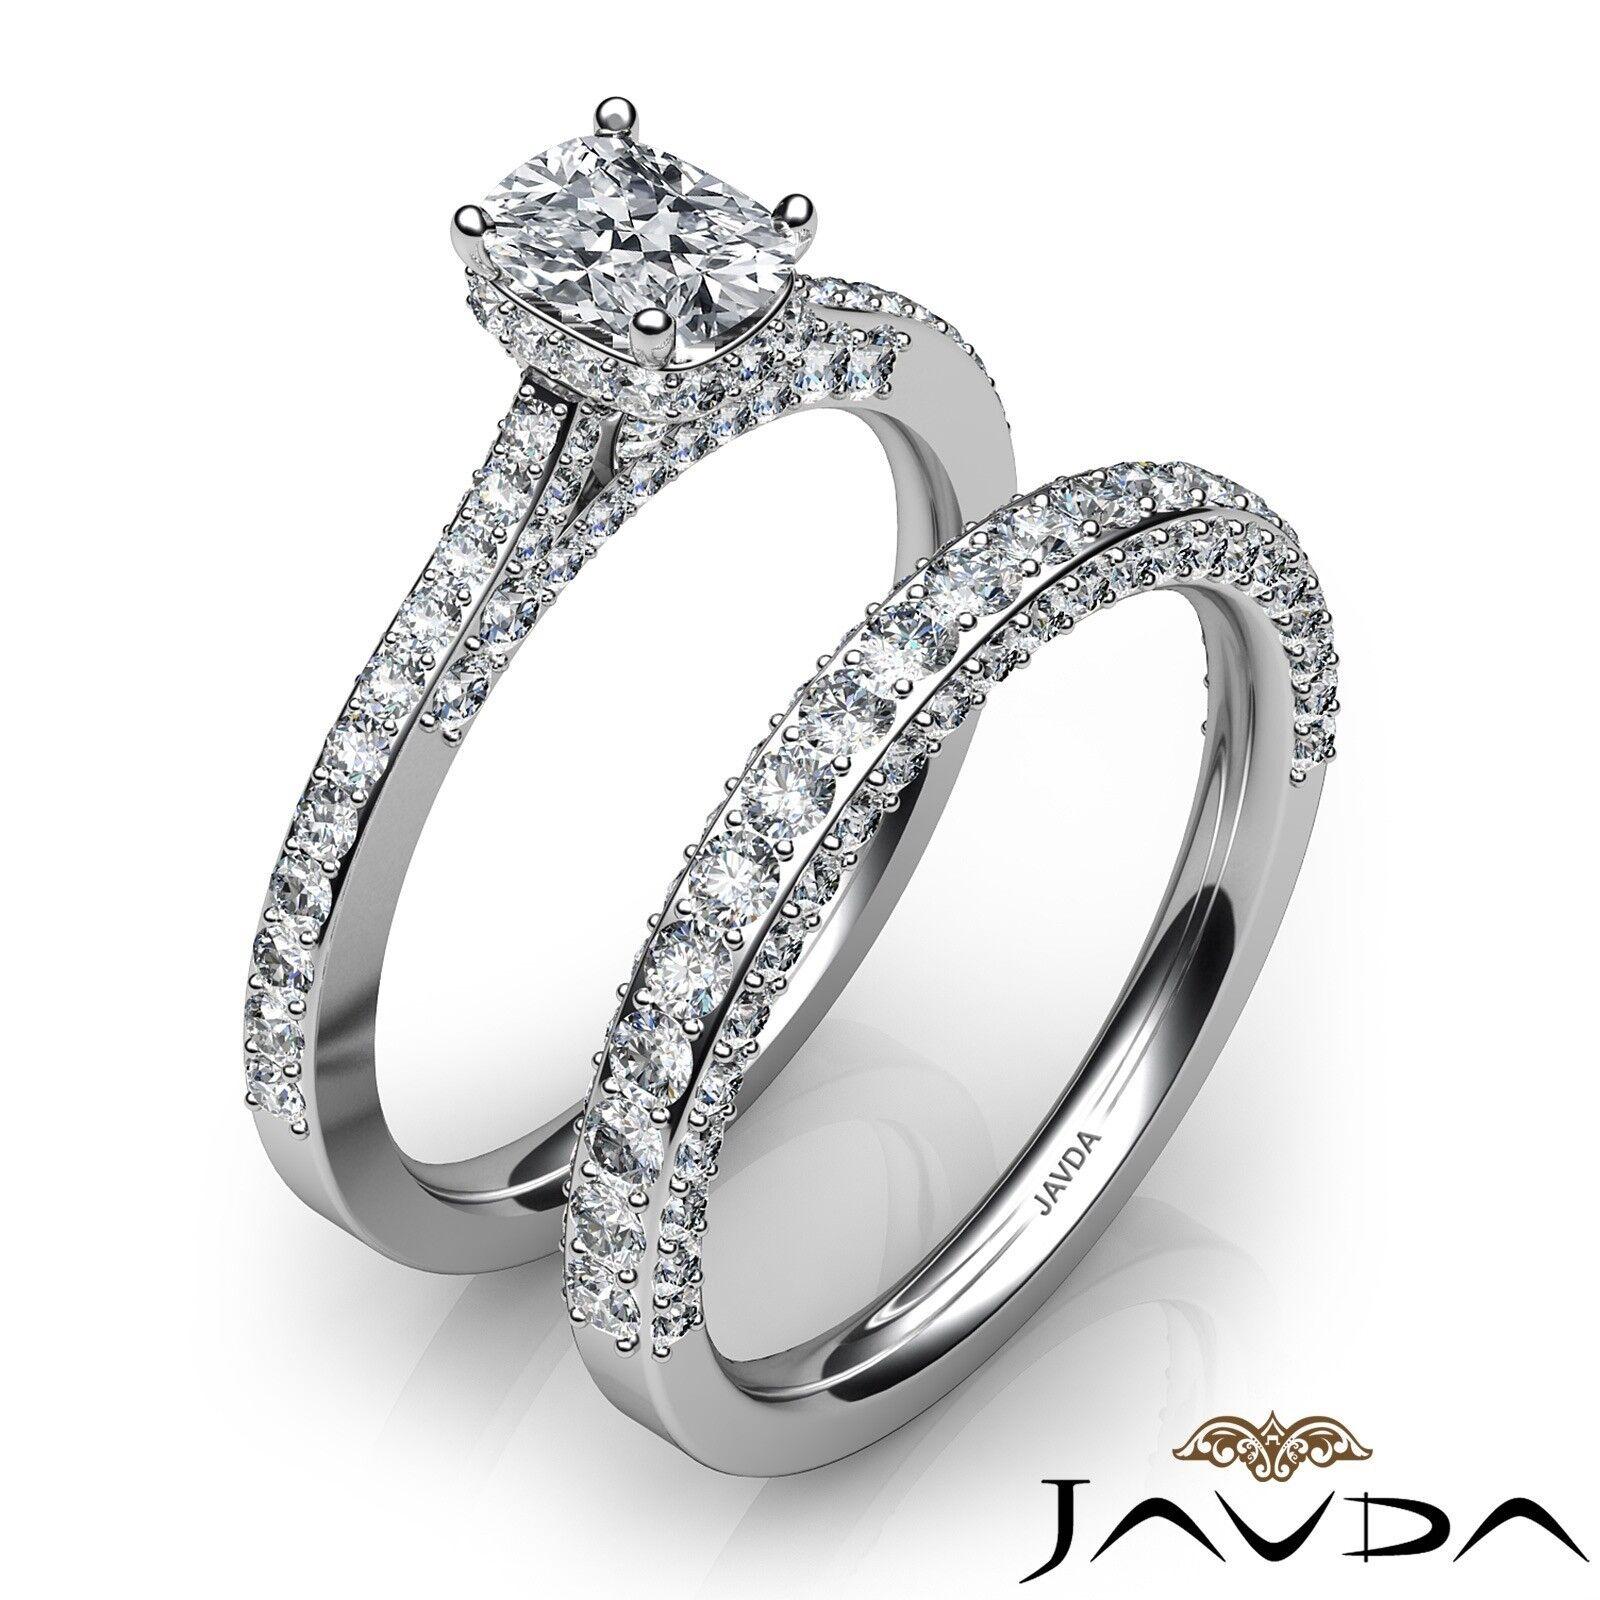 2.85ctw Pave Circa Halo Bridal Cushion Diamond Engagement Ring GIA F-VS1 W Gold 2